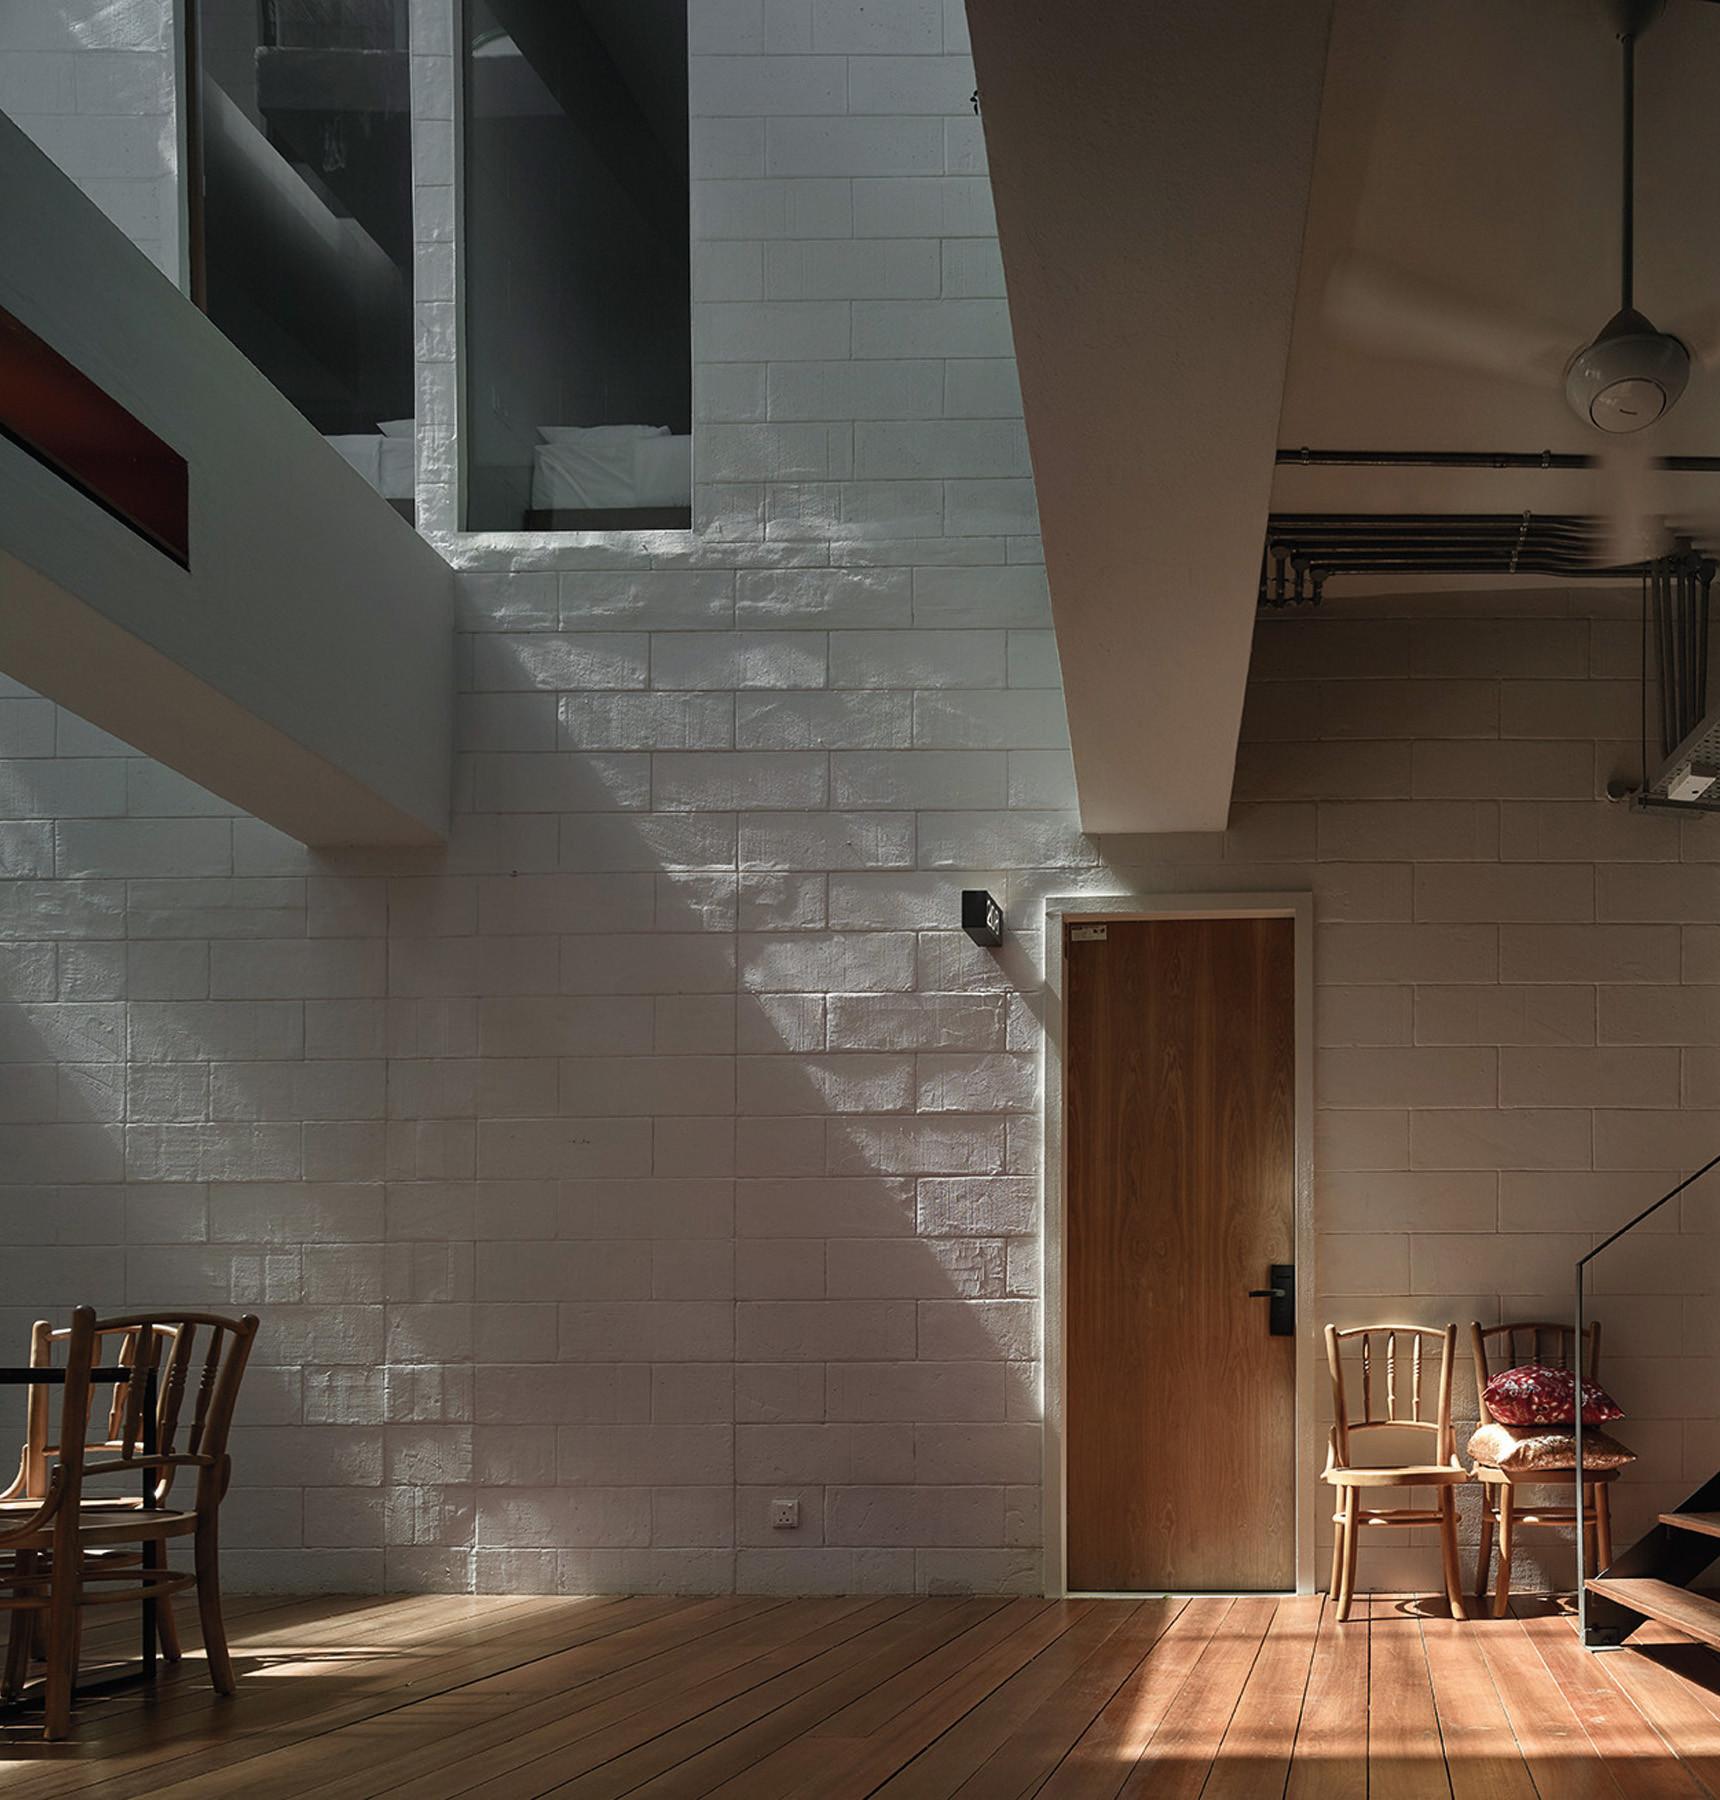 Lantern Hotel / ZLGdesign